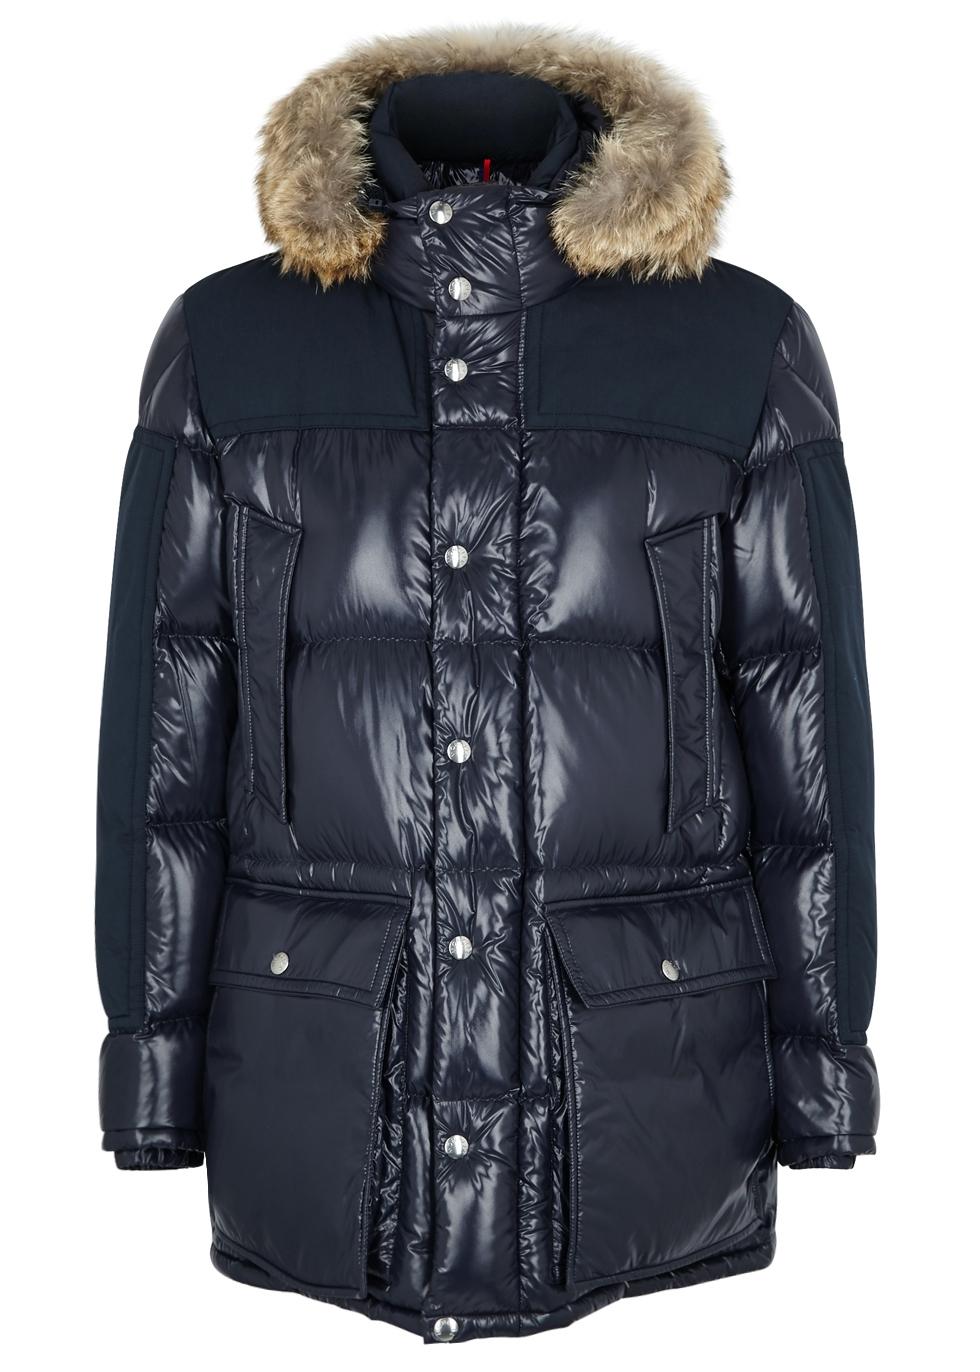 9b63e1fbd2b8 Moncler - Designer Jackets